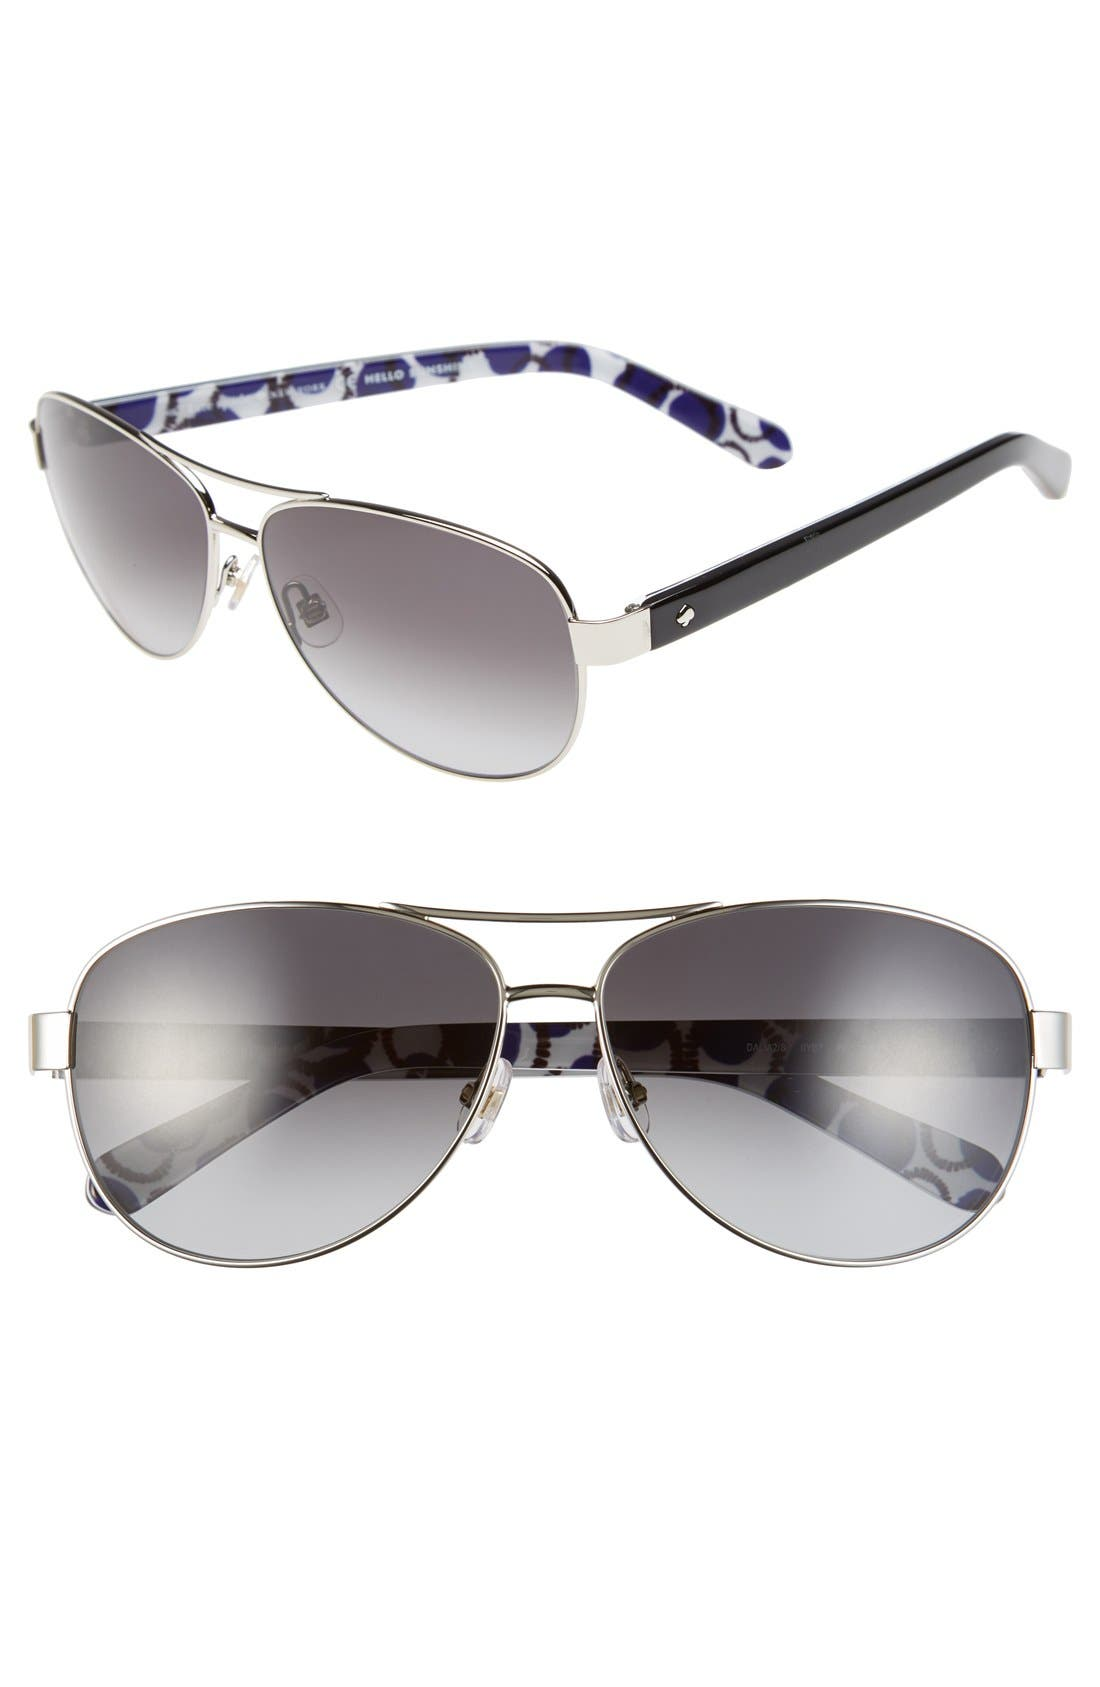 Alternate Image 1 Selected - kate spade new york 'dalia2' 58mm aviator sunglasses